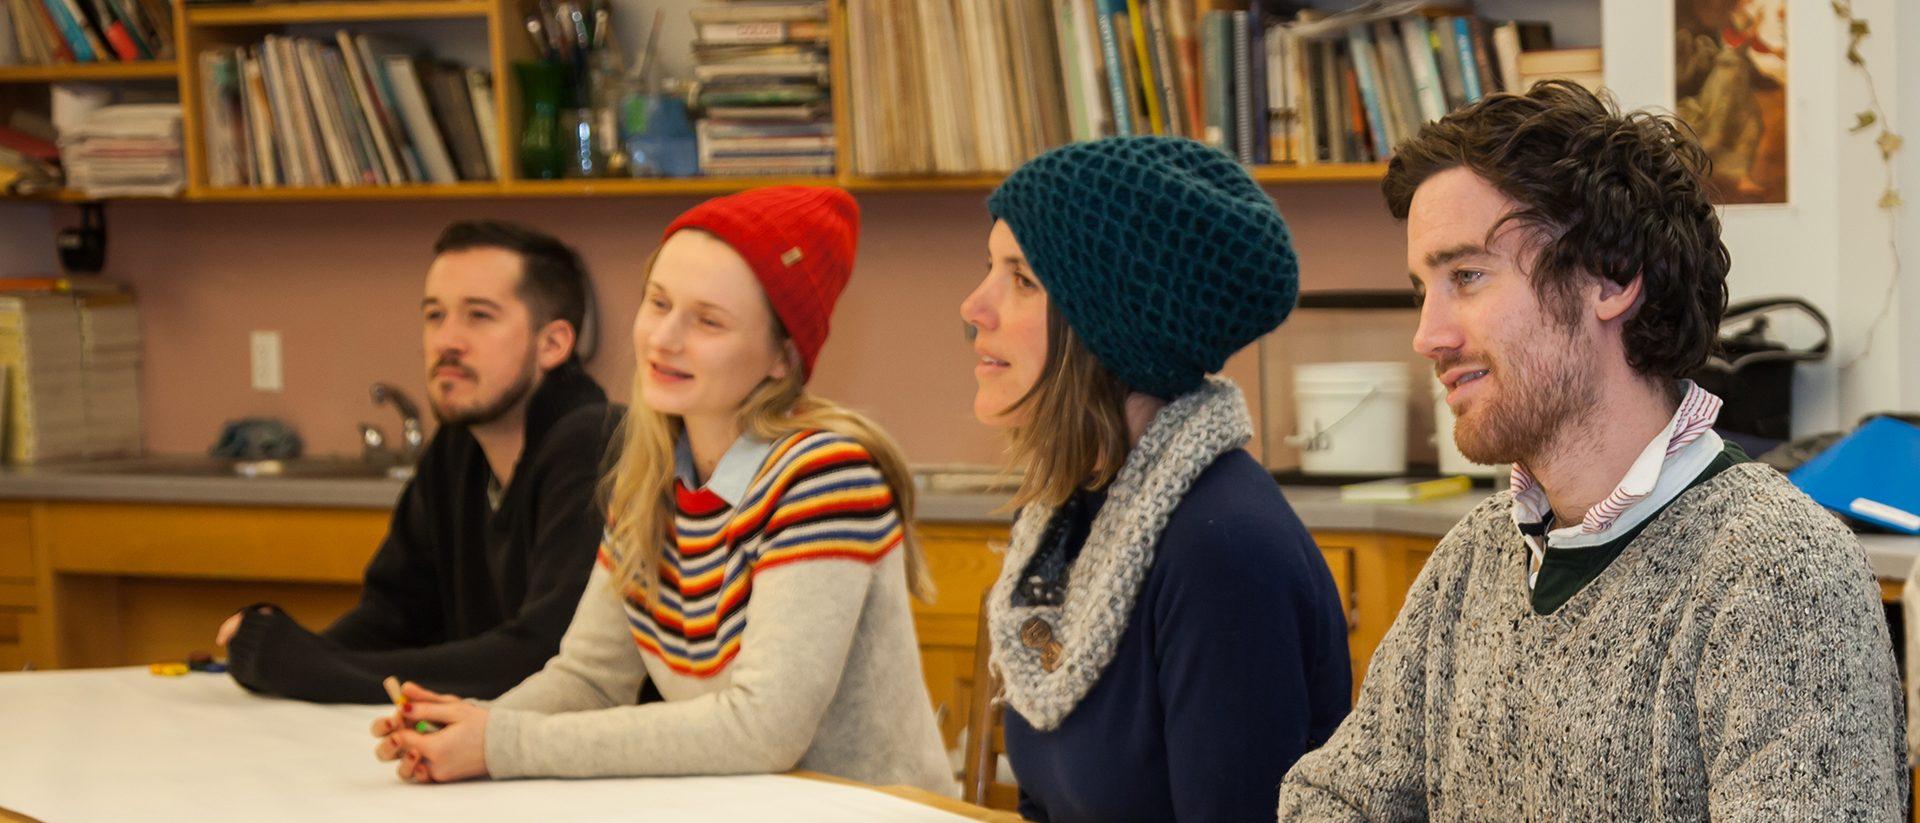 Alkion students in conversation